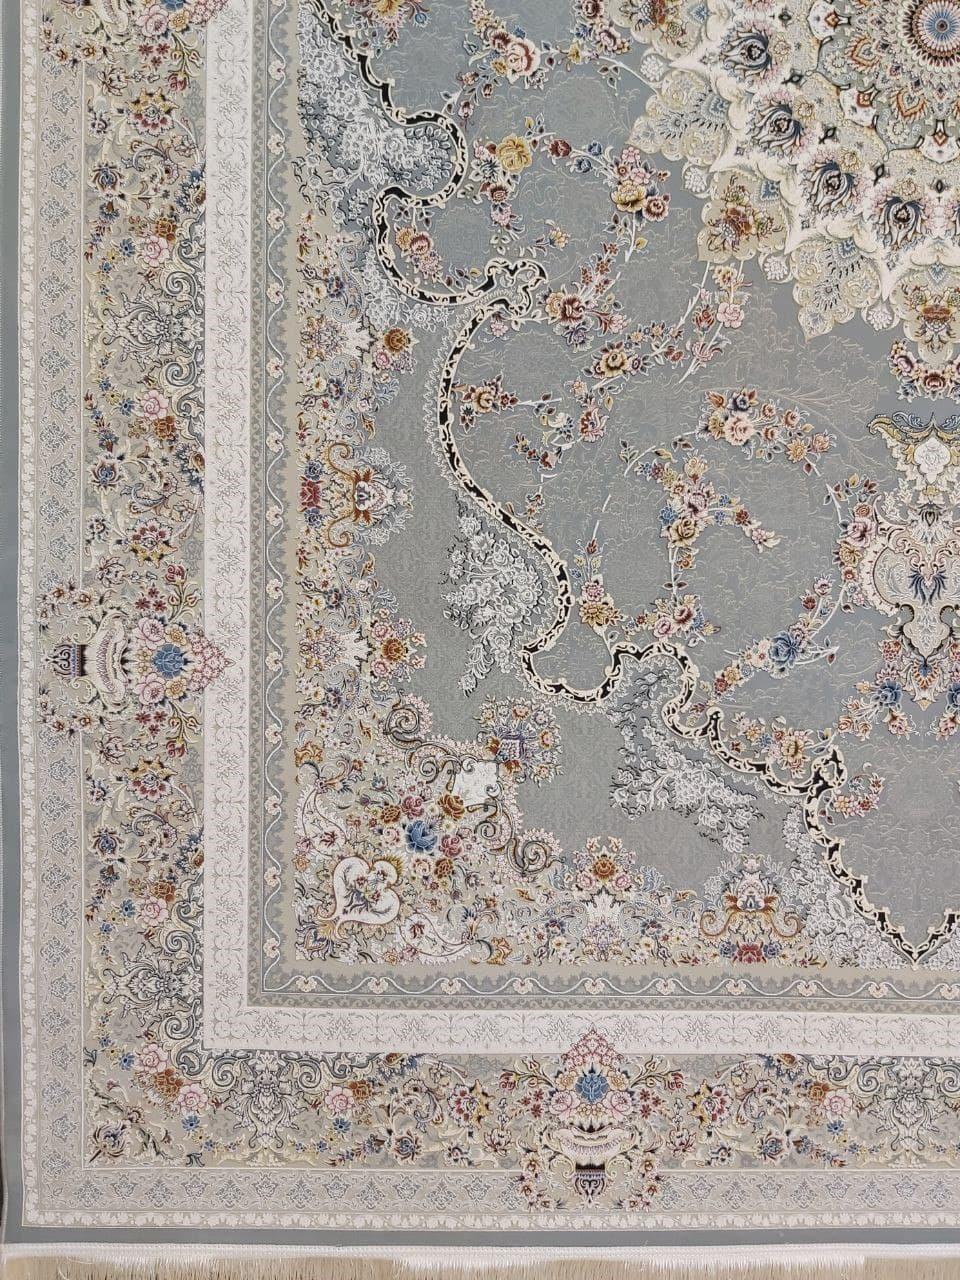 فرش 1500 شانه گل برجسته نقشه صدف زمینه فیلی